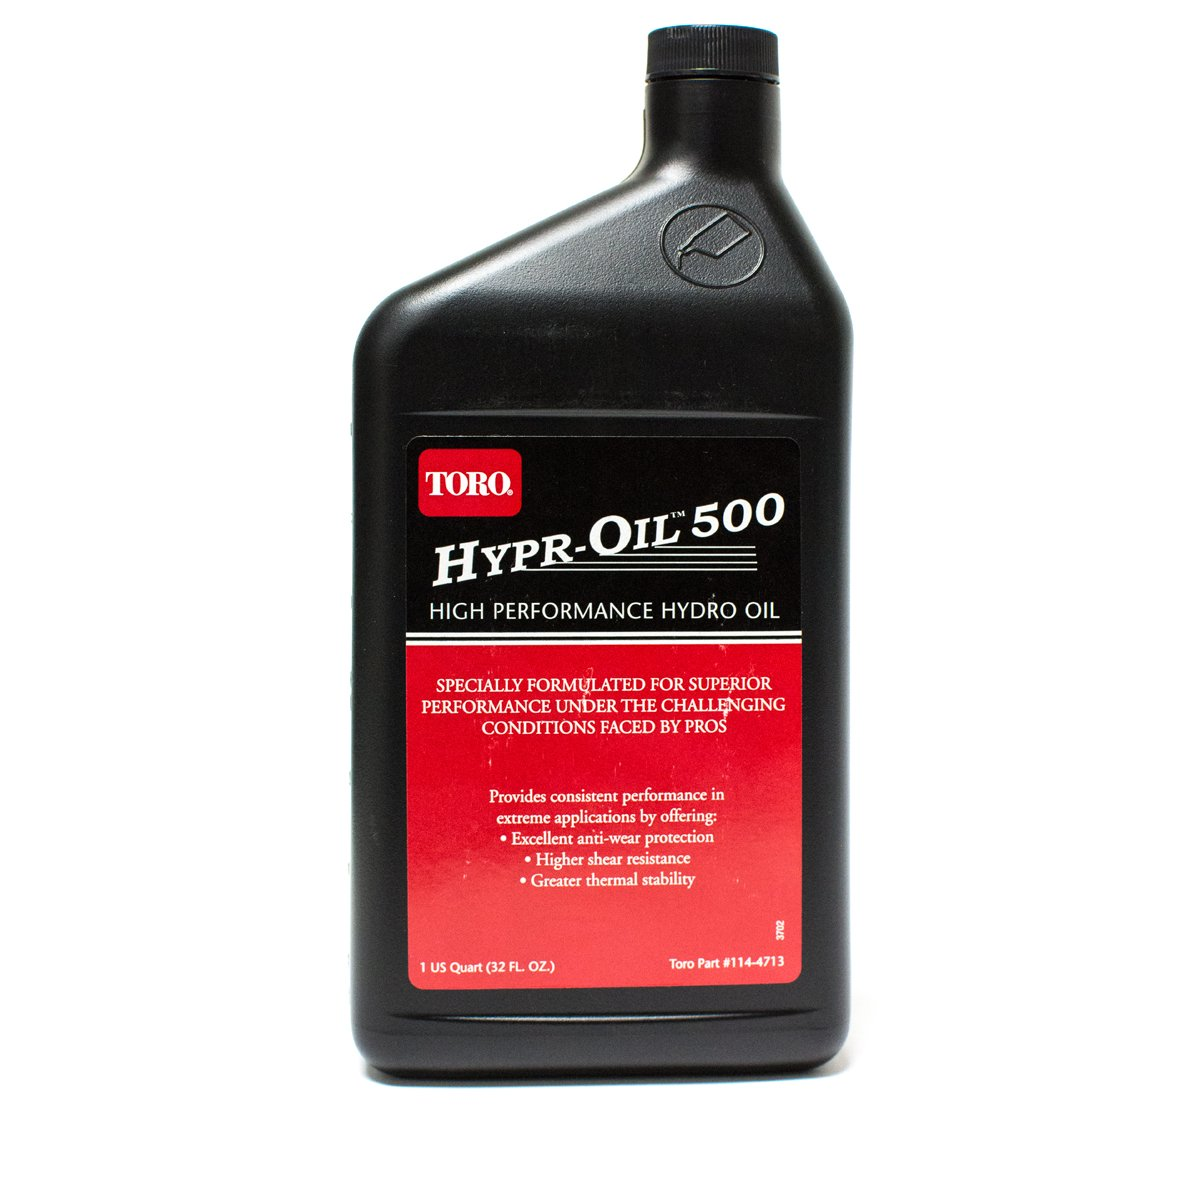 Amazon com : 12PK Toro Hypr-Oil 500 114-4713 Hydro Oil 1 Quart Zero